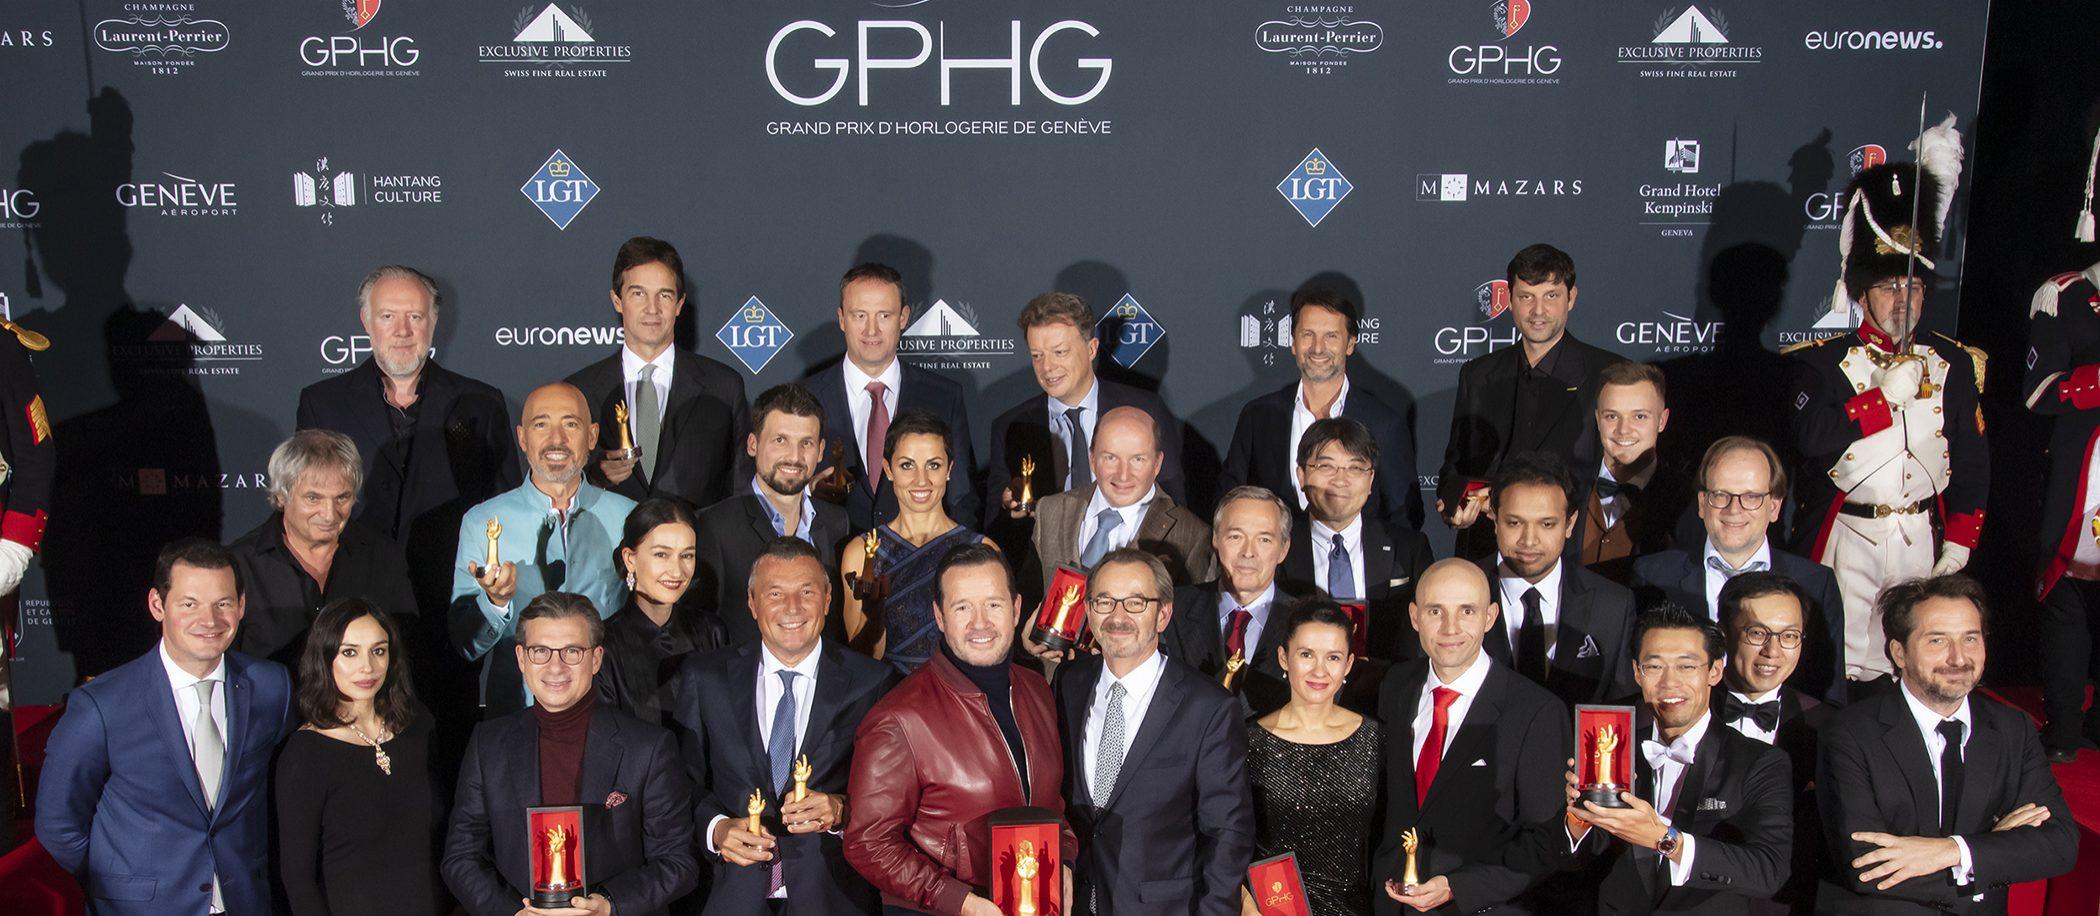 Grand Prix d'Horlogerie de Geneve – Academy